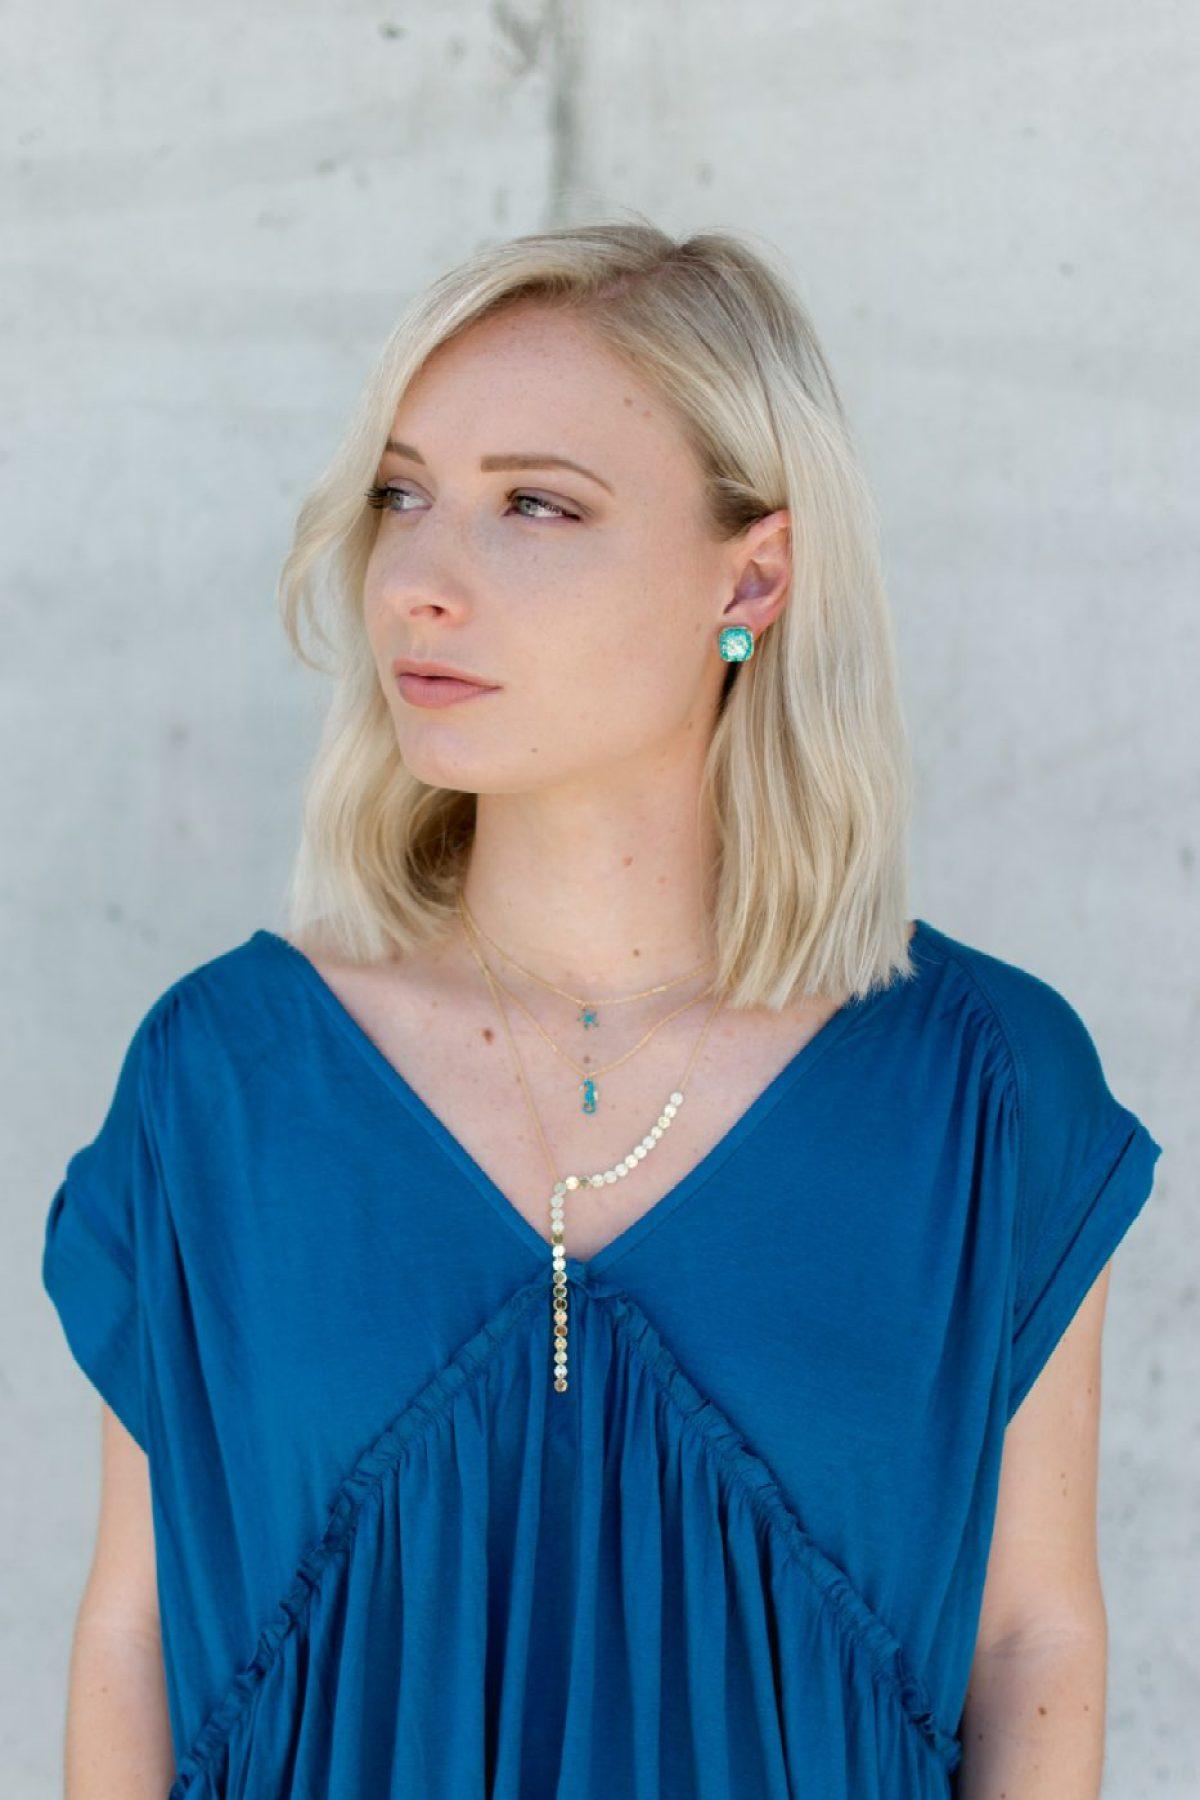 Jenny Bess wearing light blue jewelry and dark blue blouse